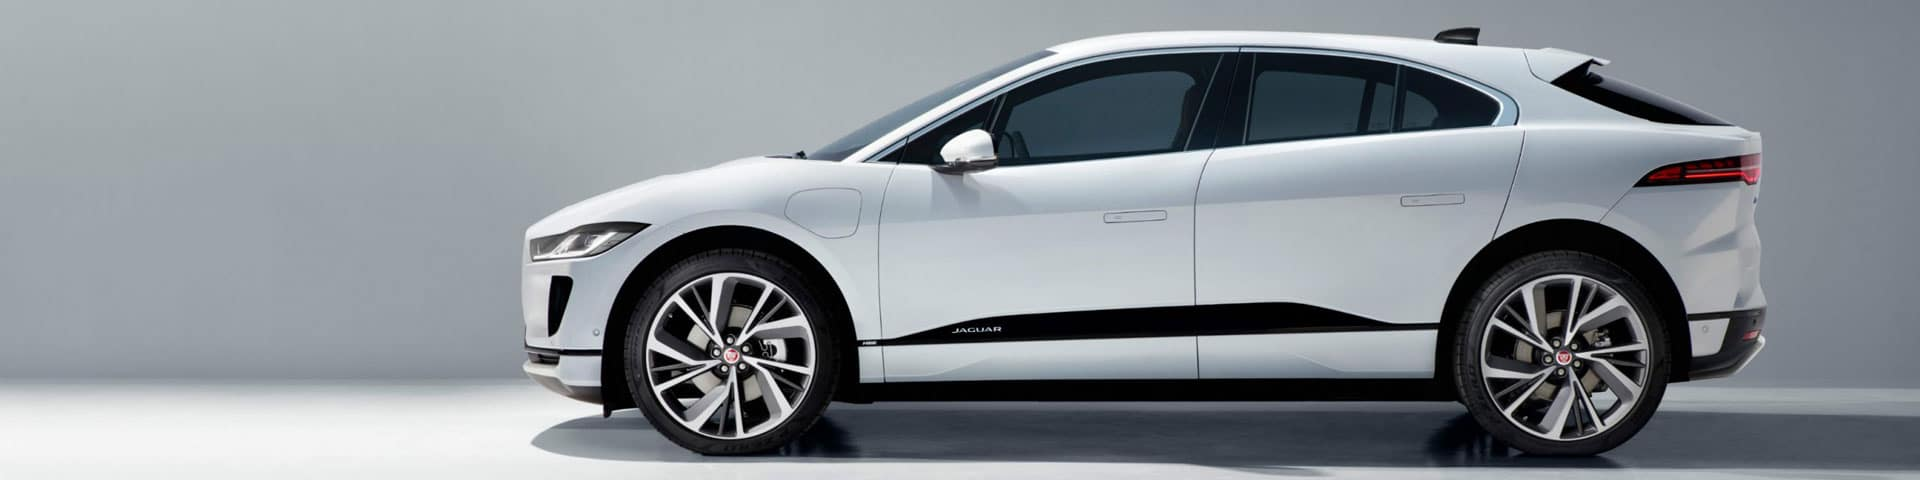 2021 Jaguar I-Pace in Oklahoma City